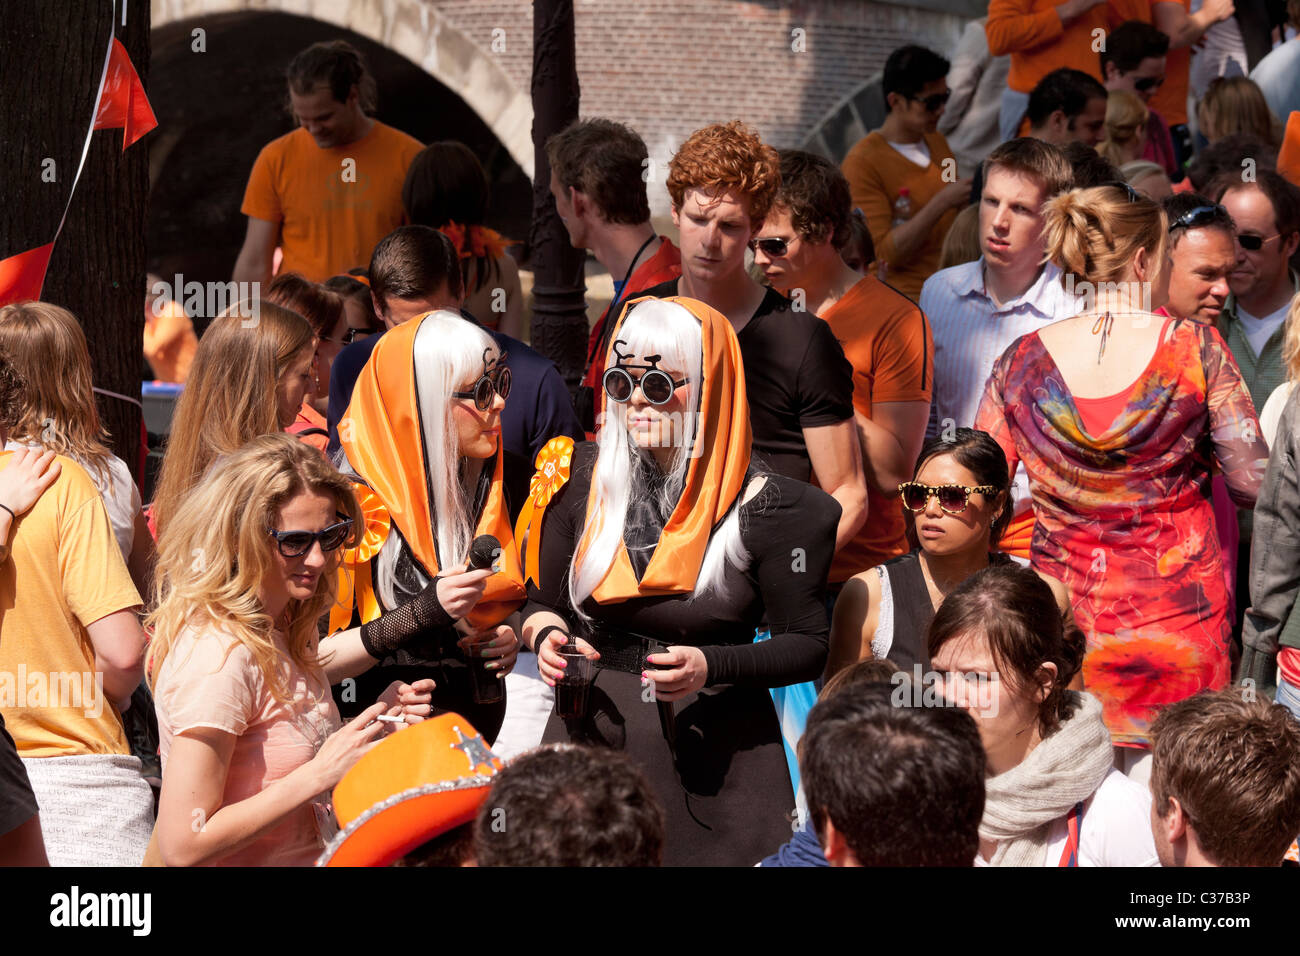 https://c7.alamy.com/comp/C37B3P/two-lady-gaga-look-a-likes-on-kingsday-the-kings-birthday-in-amsterdam-C37B3P.jpg